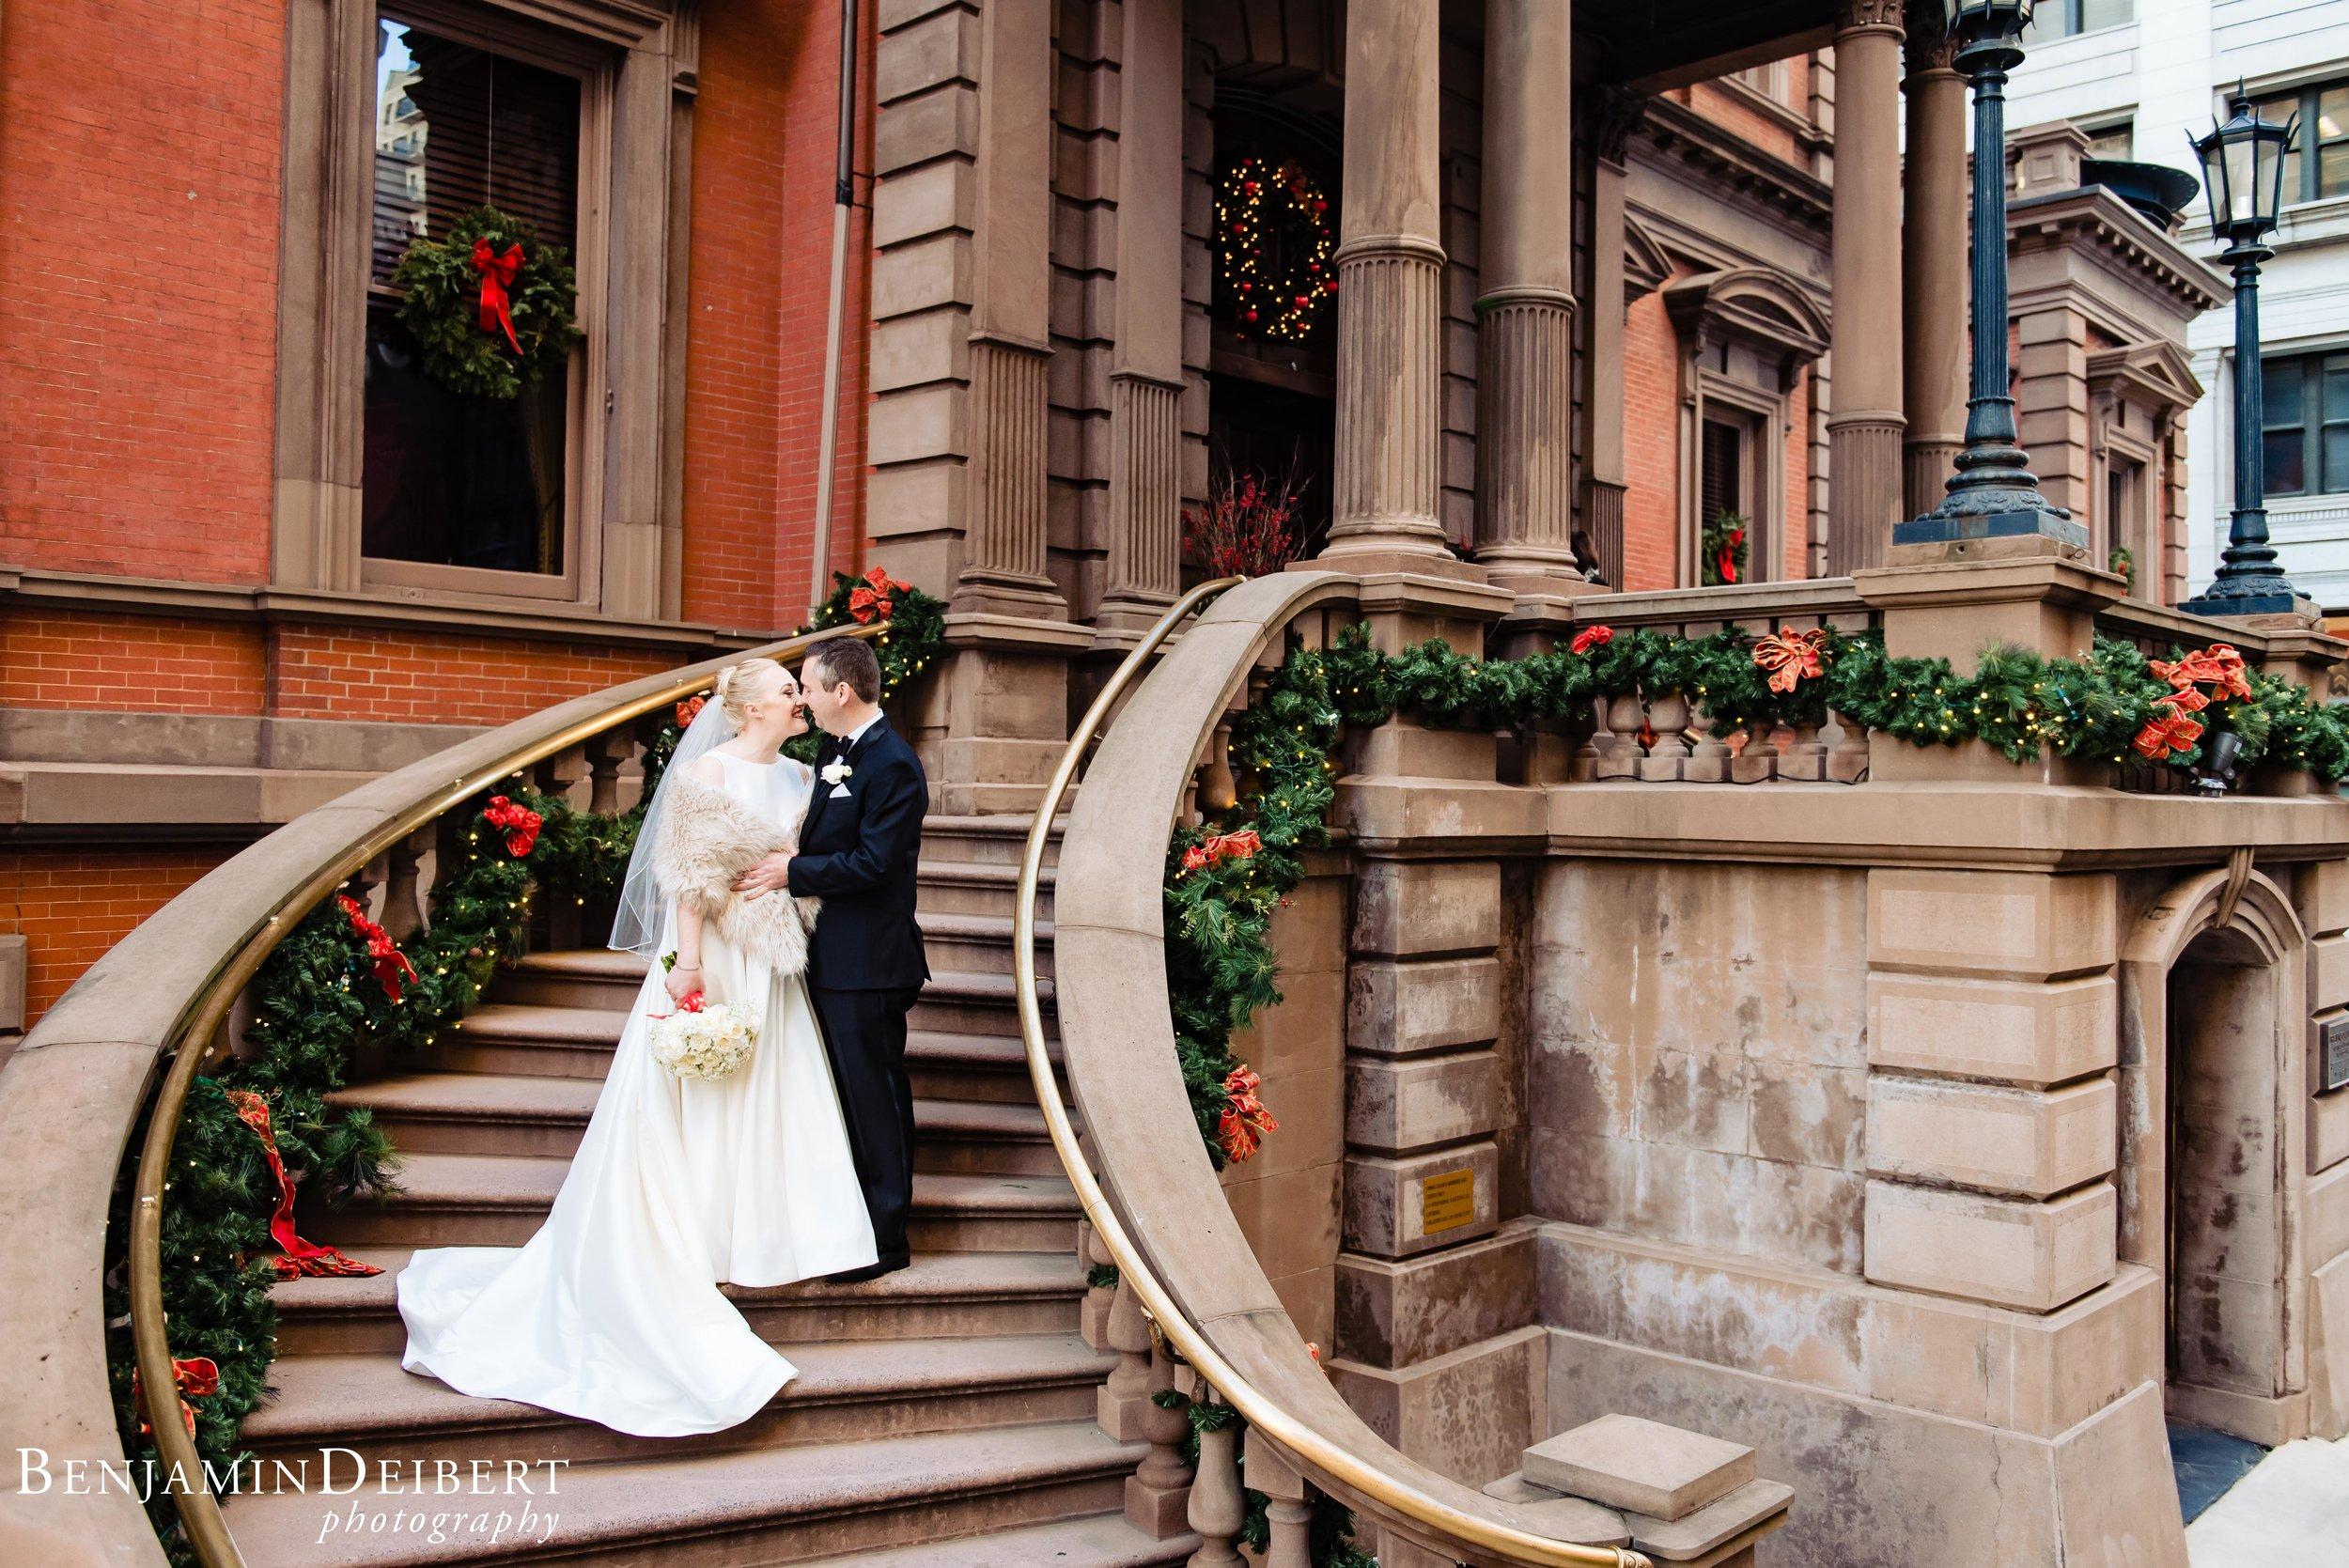 PatriceandAdam_TheLucy__Cescaphe_Wedding-24.jpg